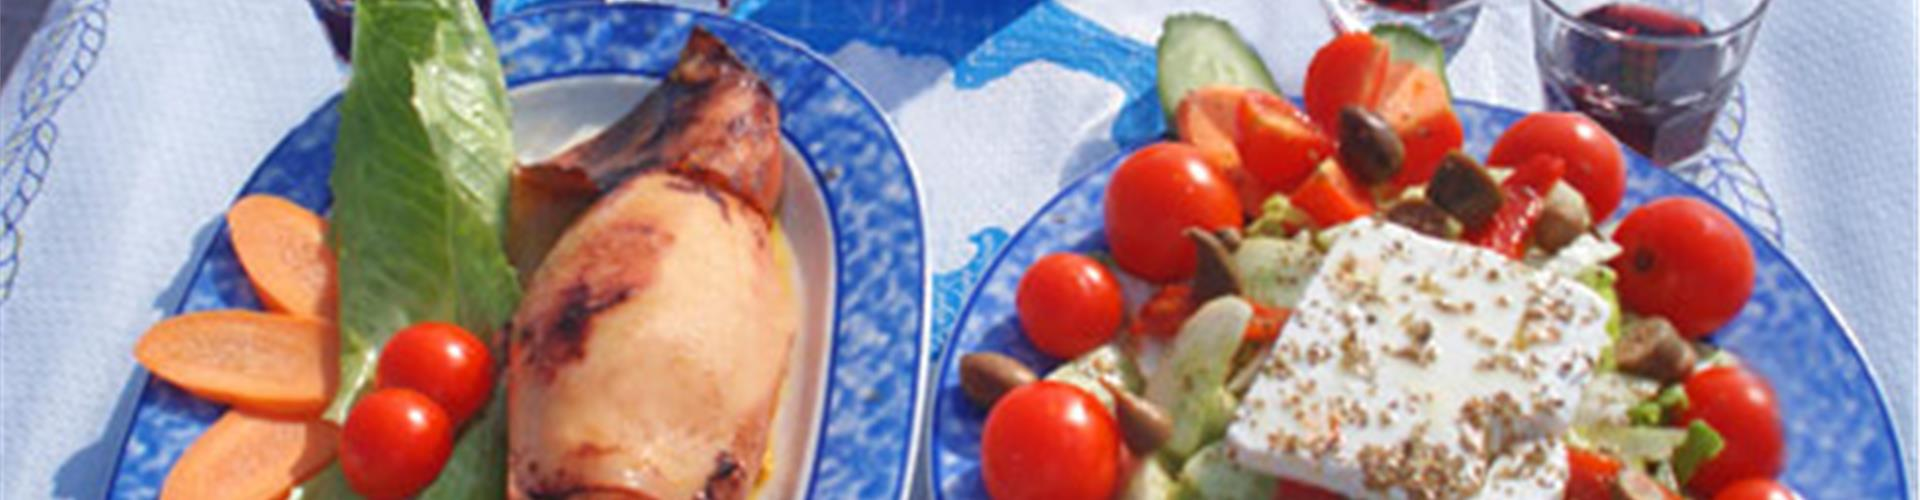 Santorini: A gastronomic destination